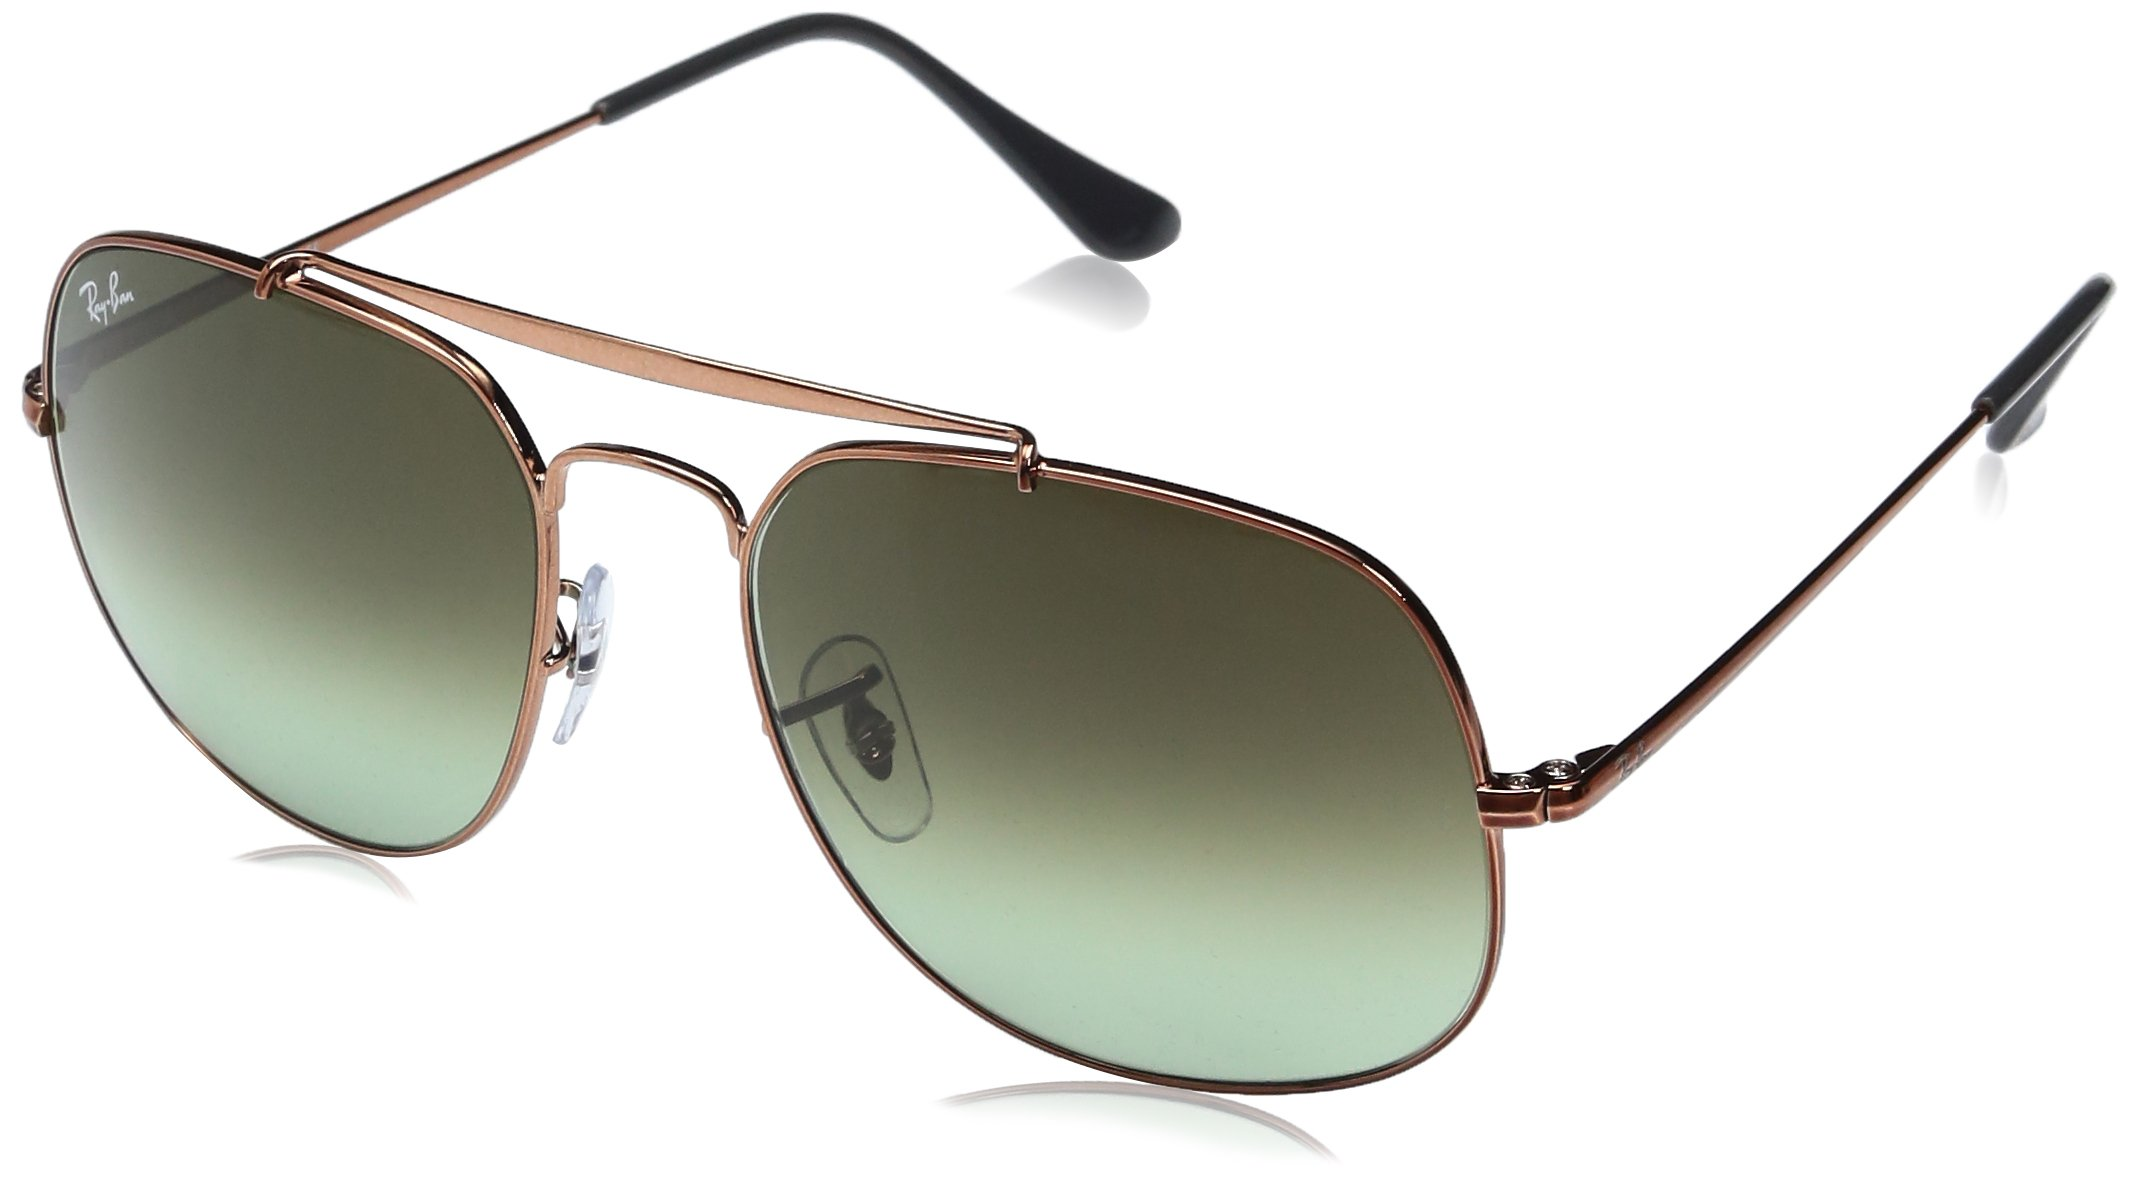 Ray-Ban Men's Steel Man Square Sunglasses, Medium Bronze, 57 mm